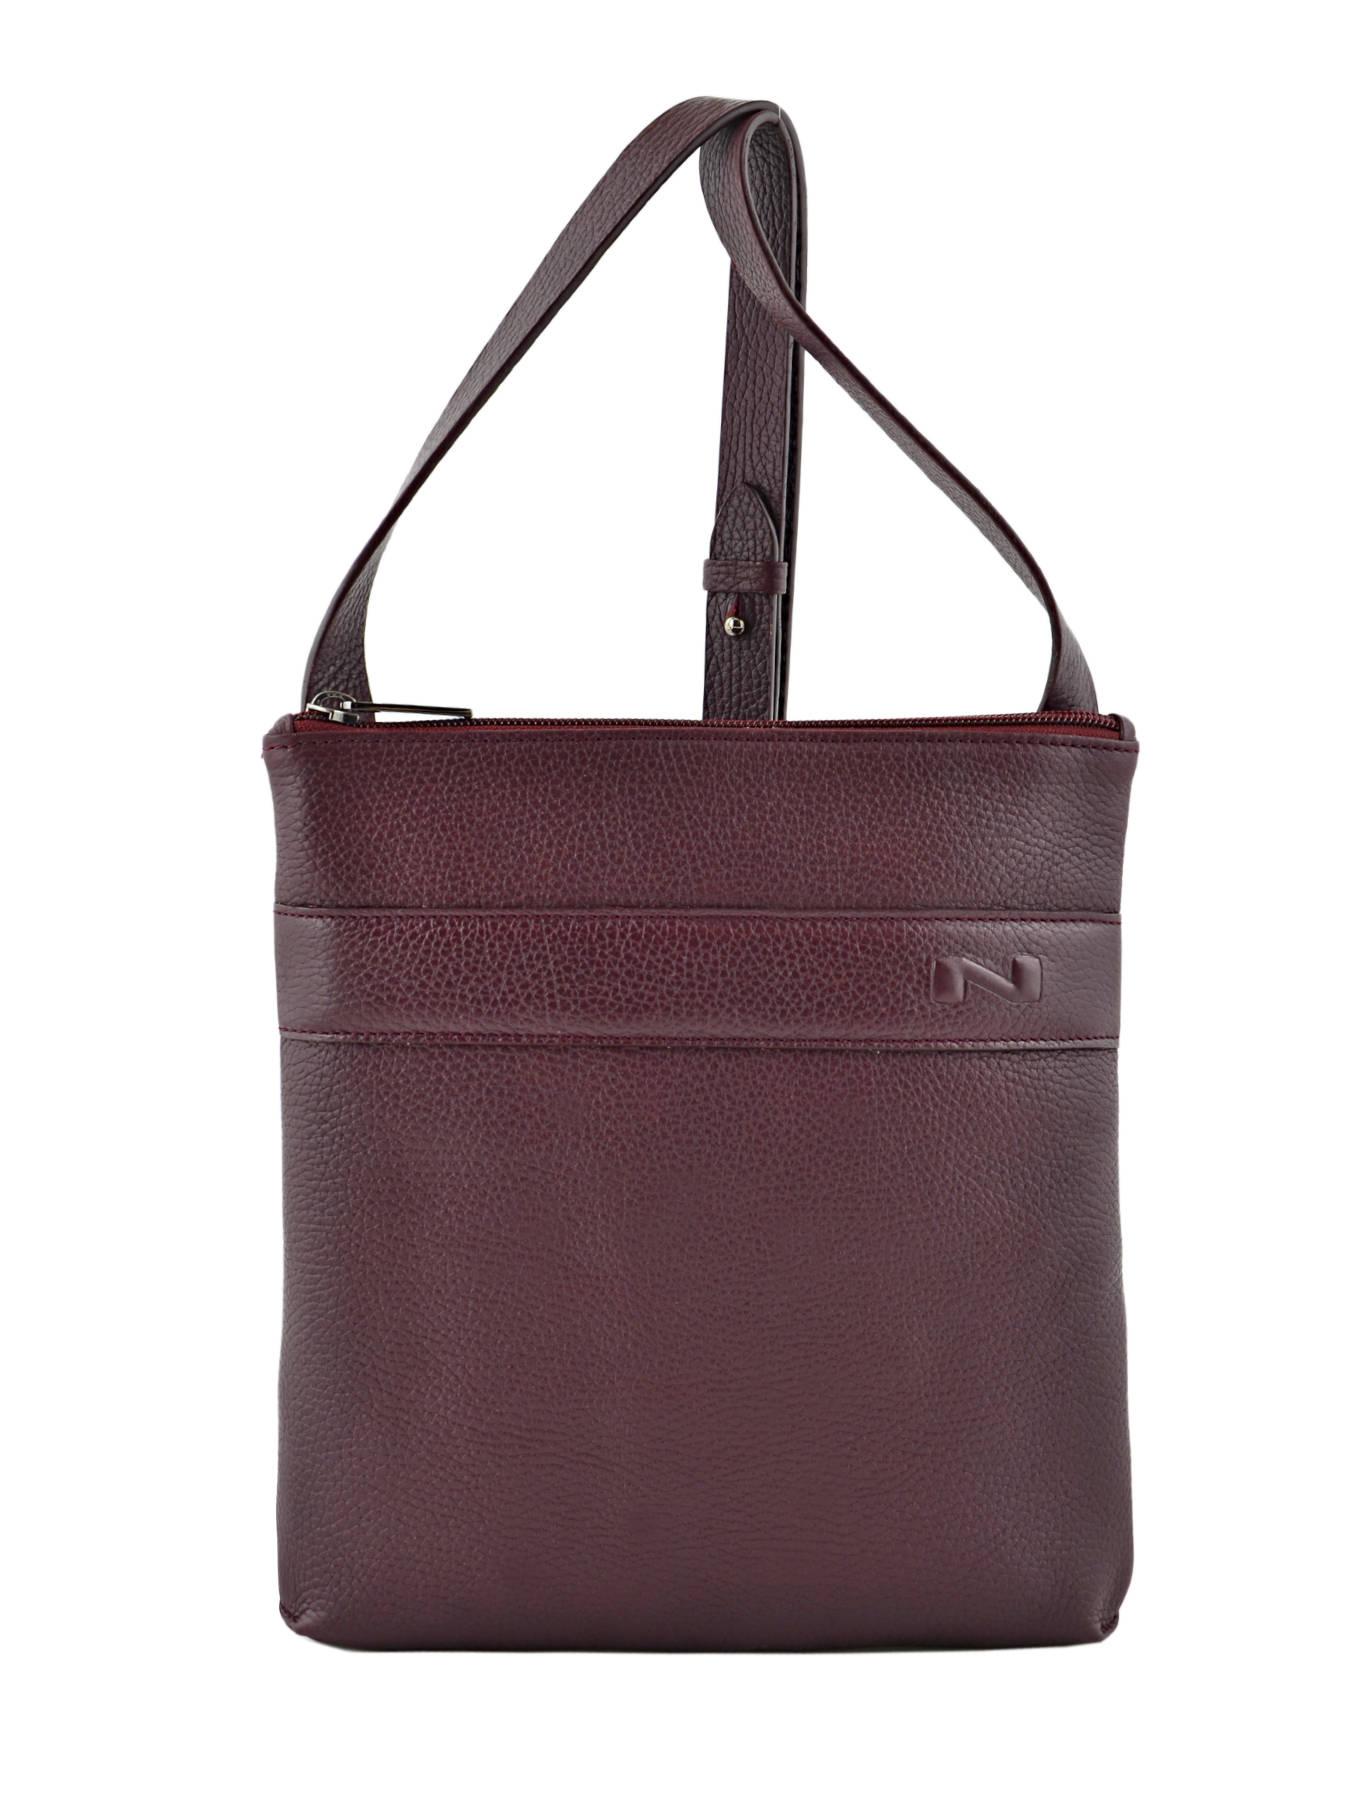 6178c603b0b1 ... Shoulder Bag N City Leather Nathan baume Red n city N1621018 ...